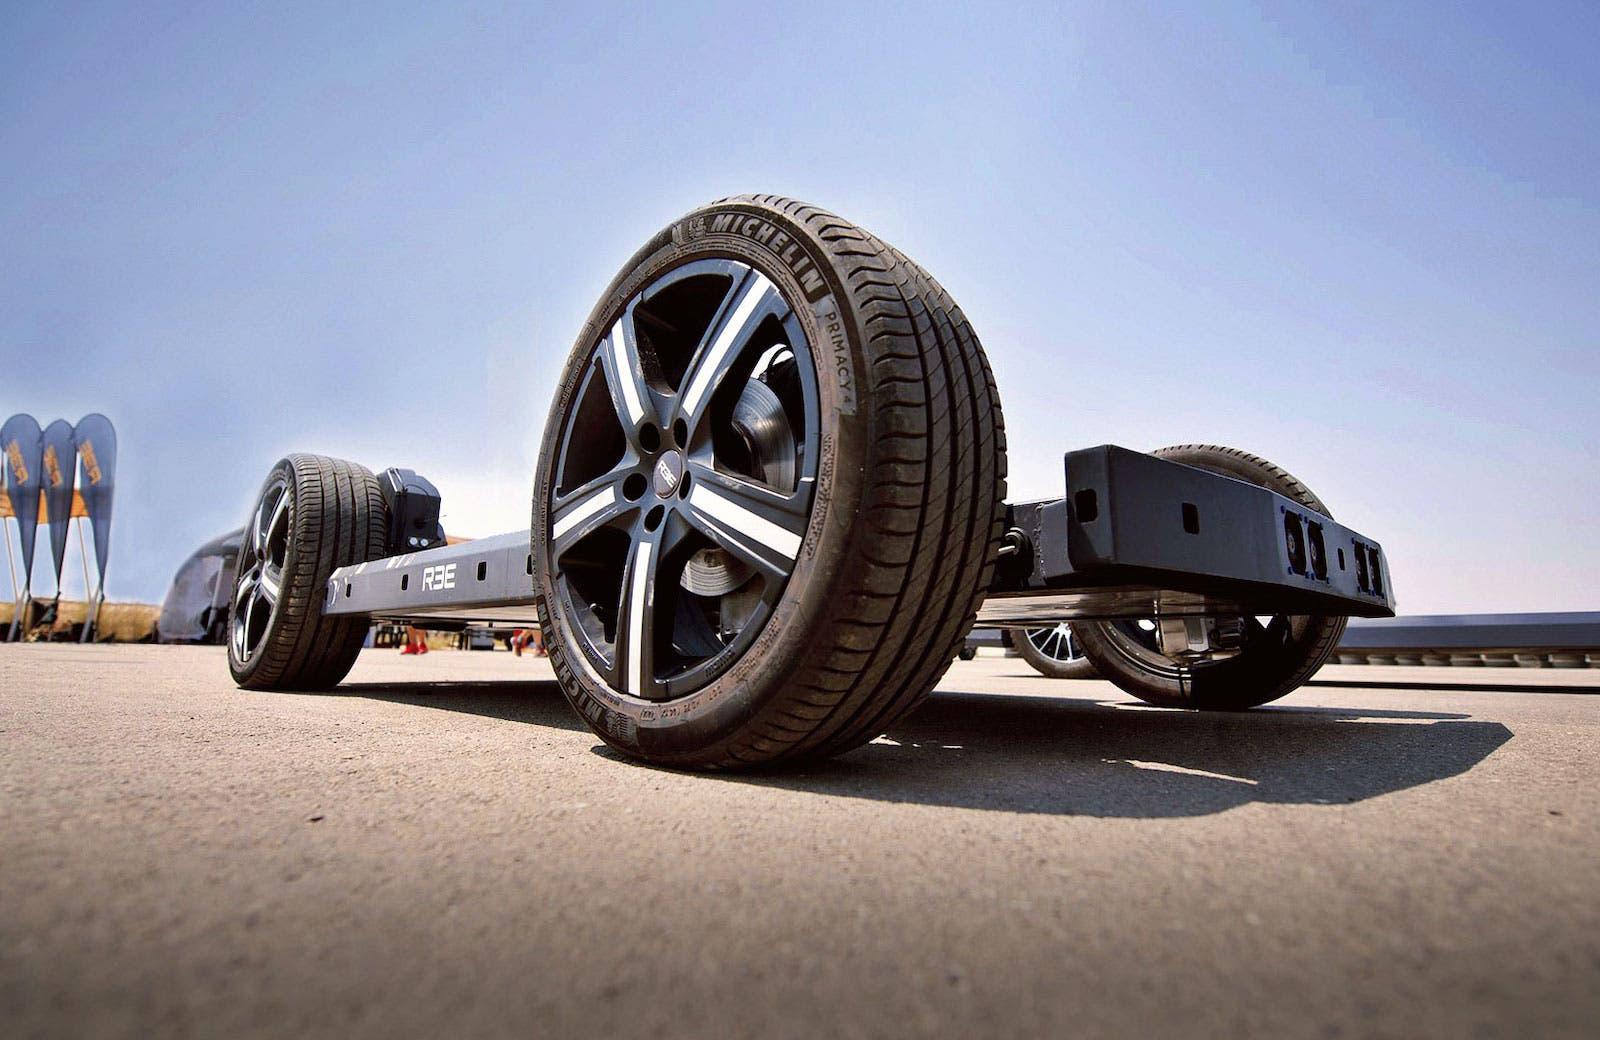 electric vehicle Texas REE Automotive